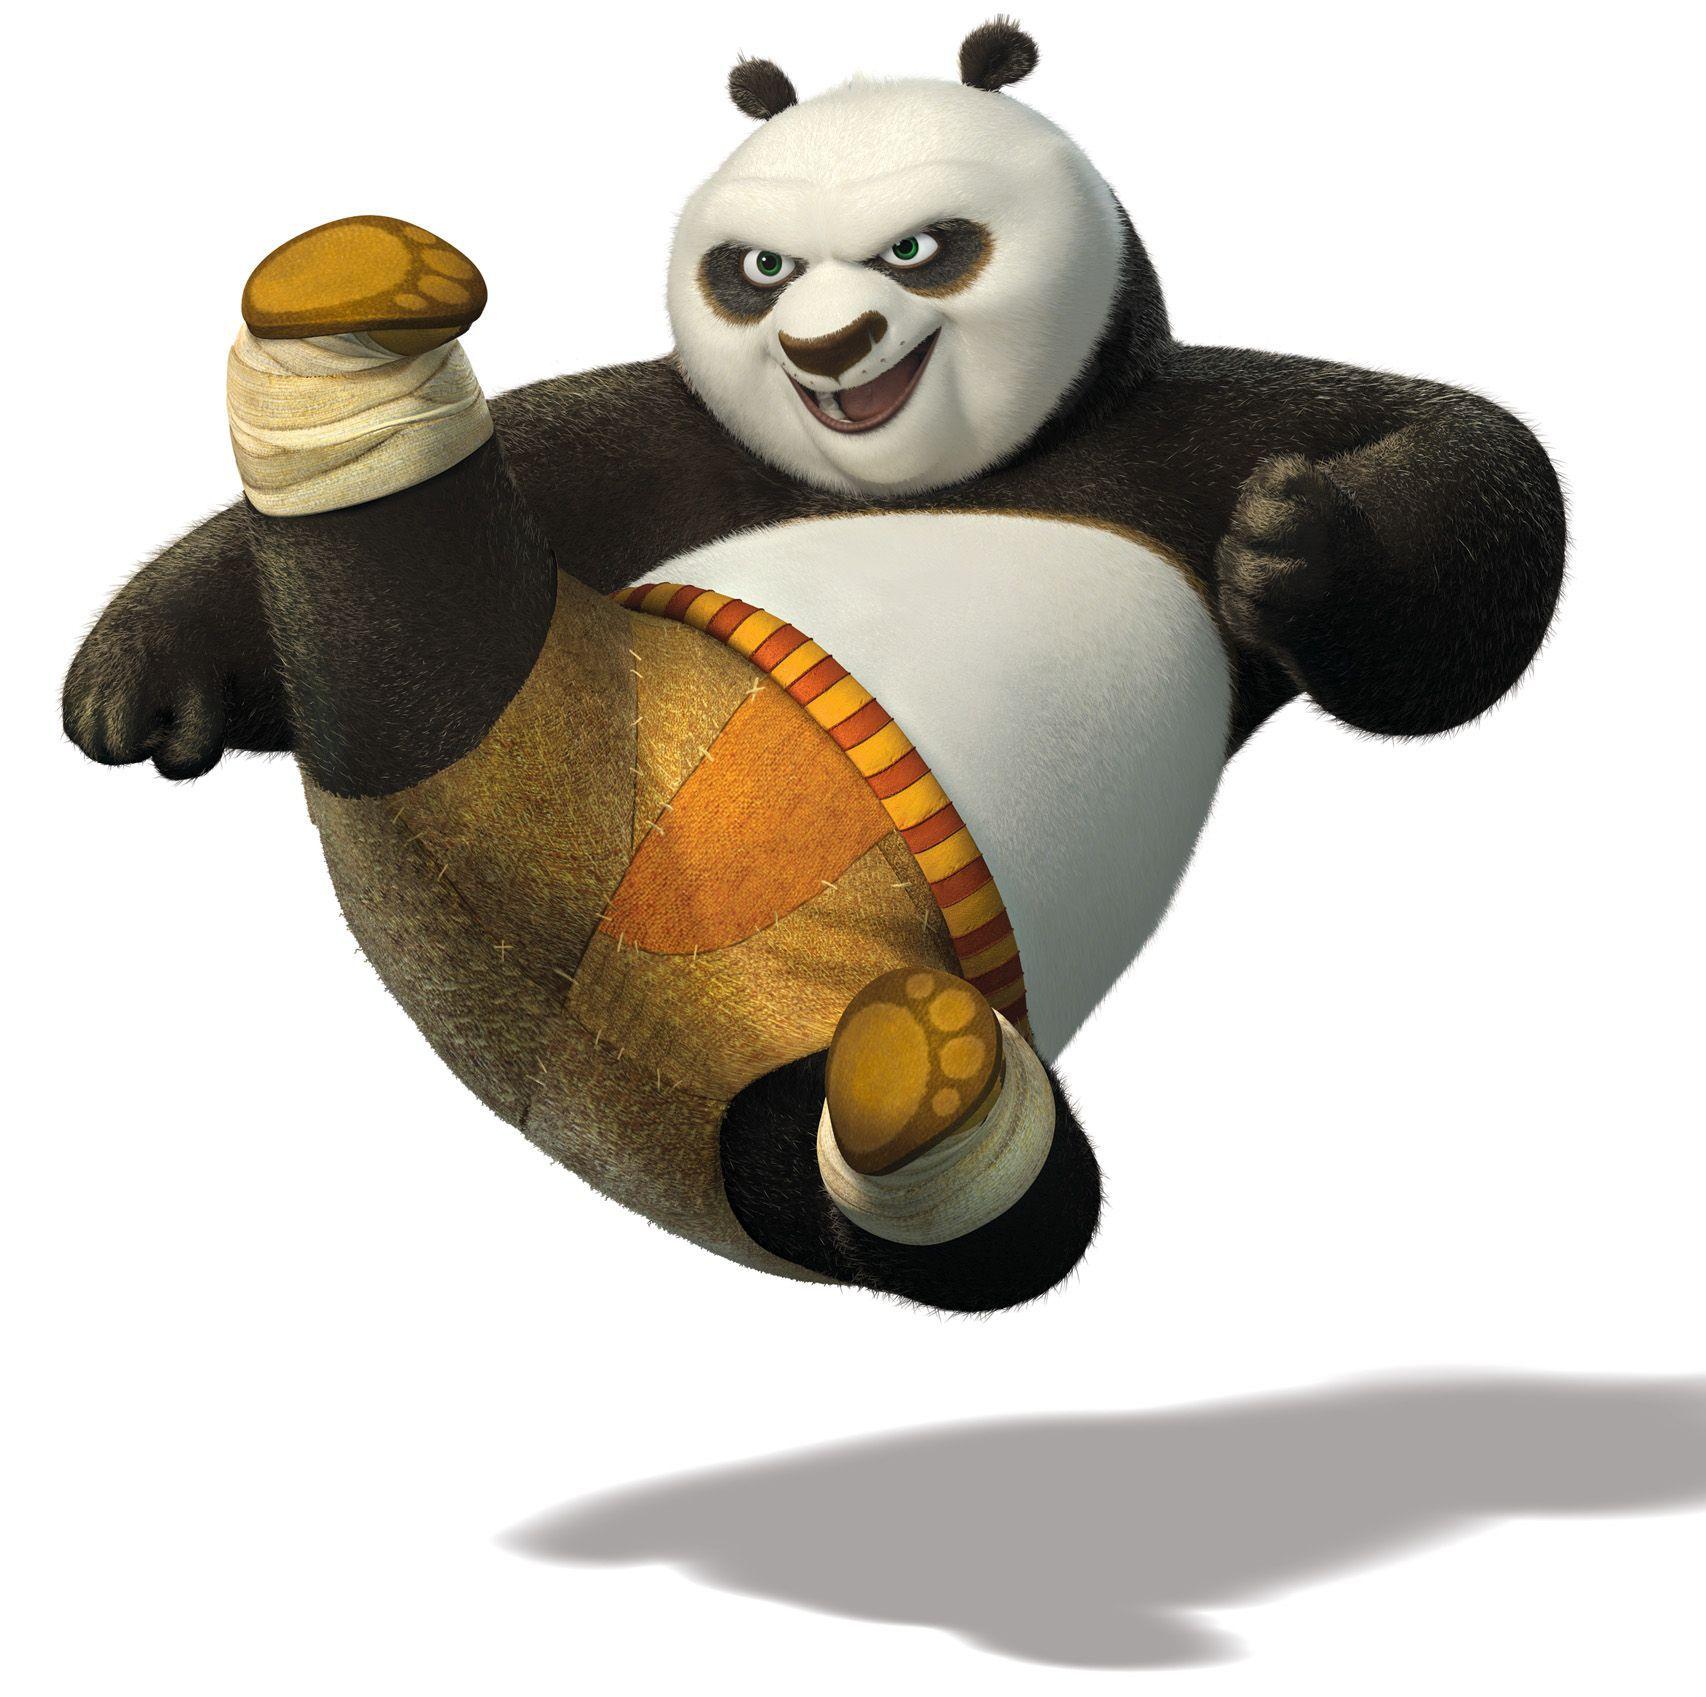 Master Xiao Po Ping